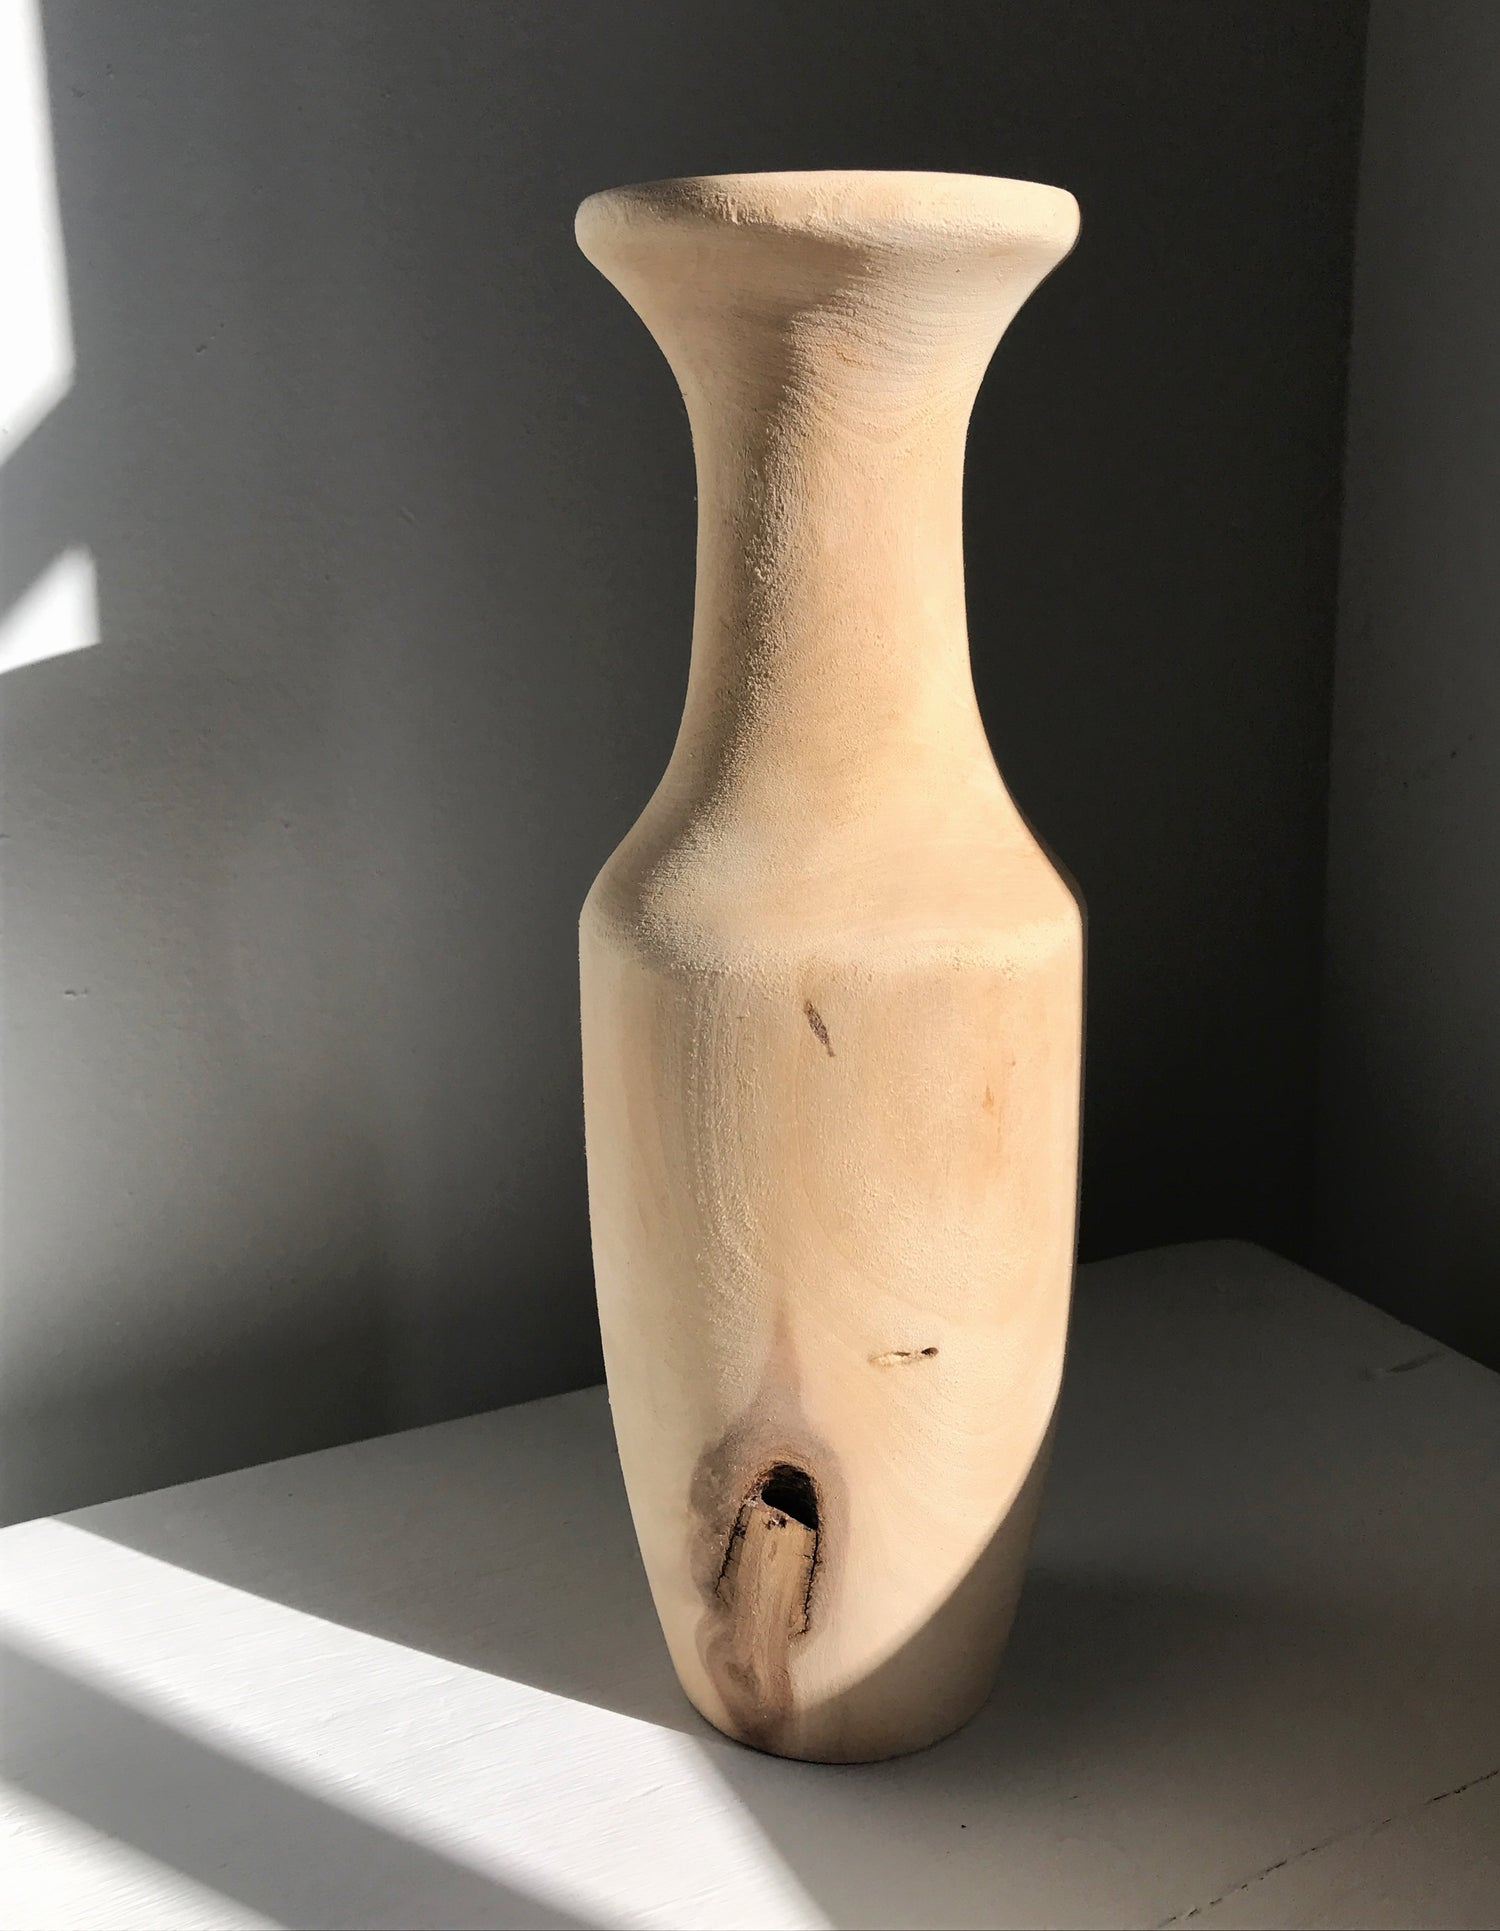 Image of Raw Wooden Vase